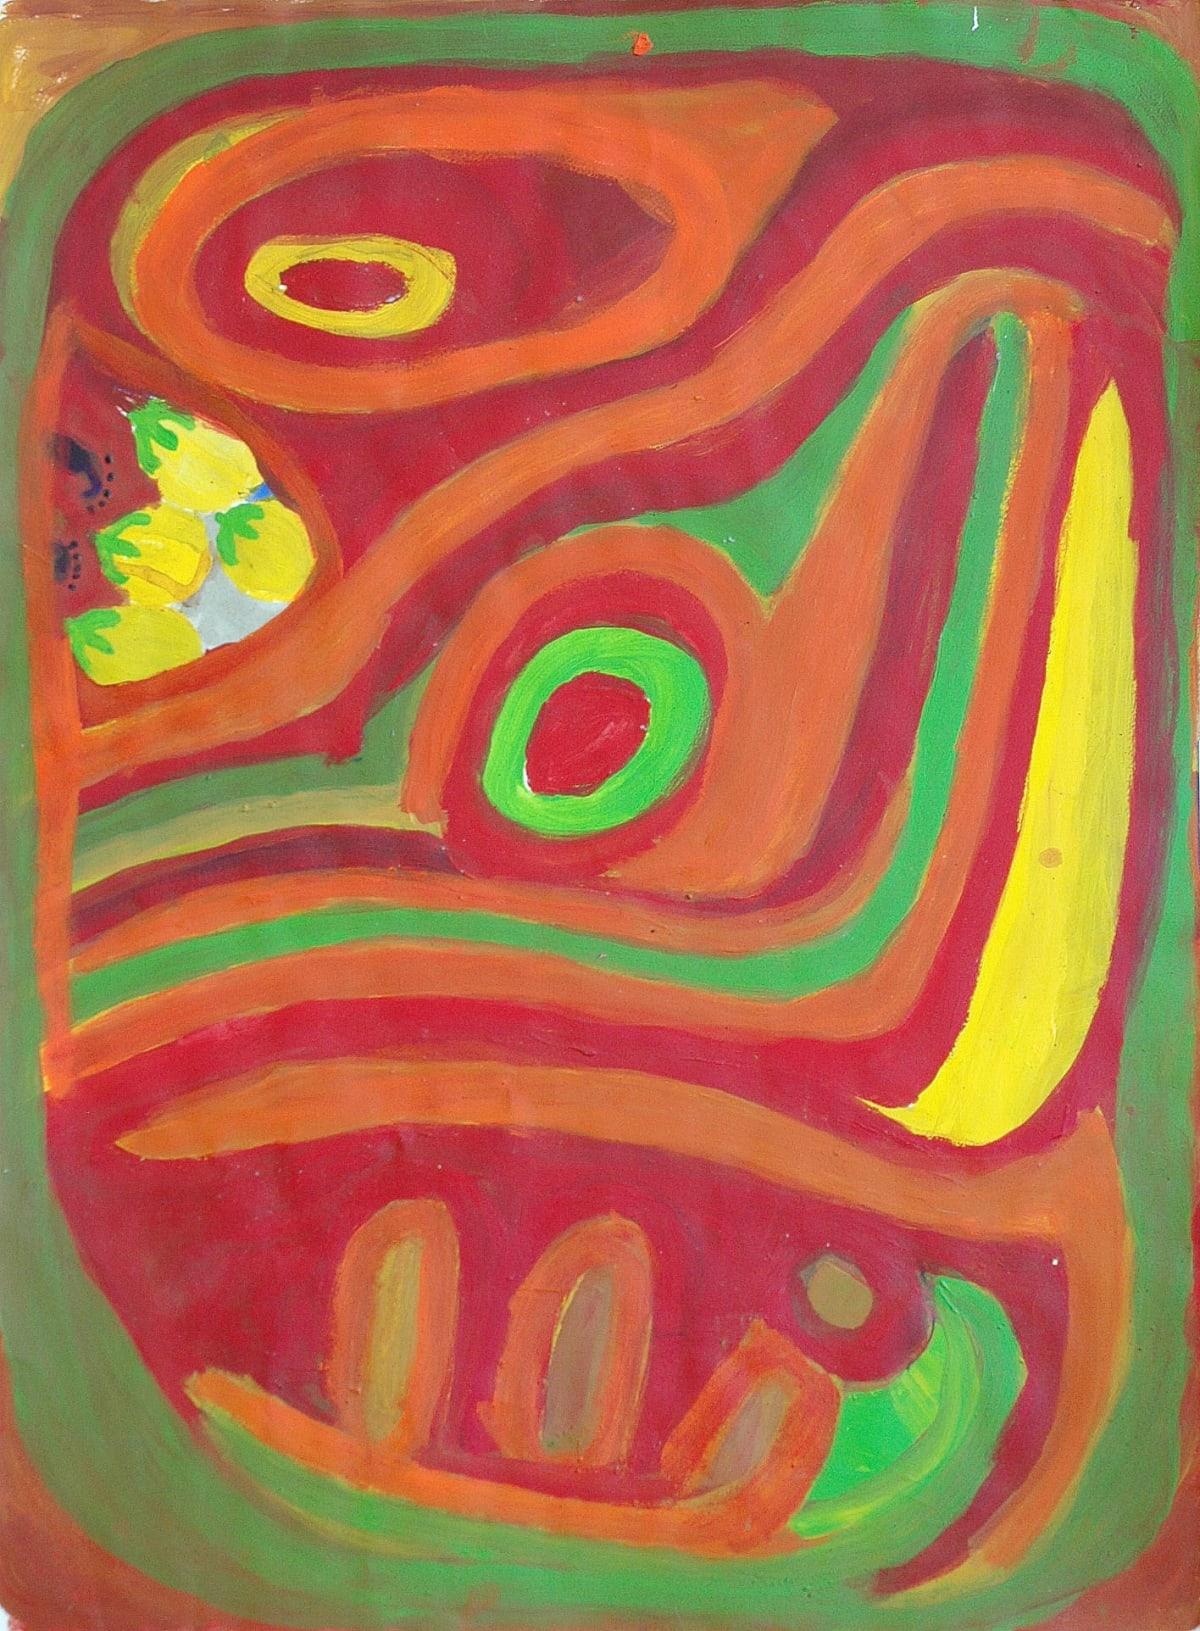 Stumpy Brown (Nyuju) Nyila acrylic on paper 56 x 76 cm